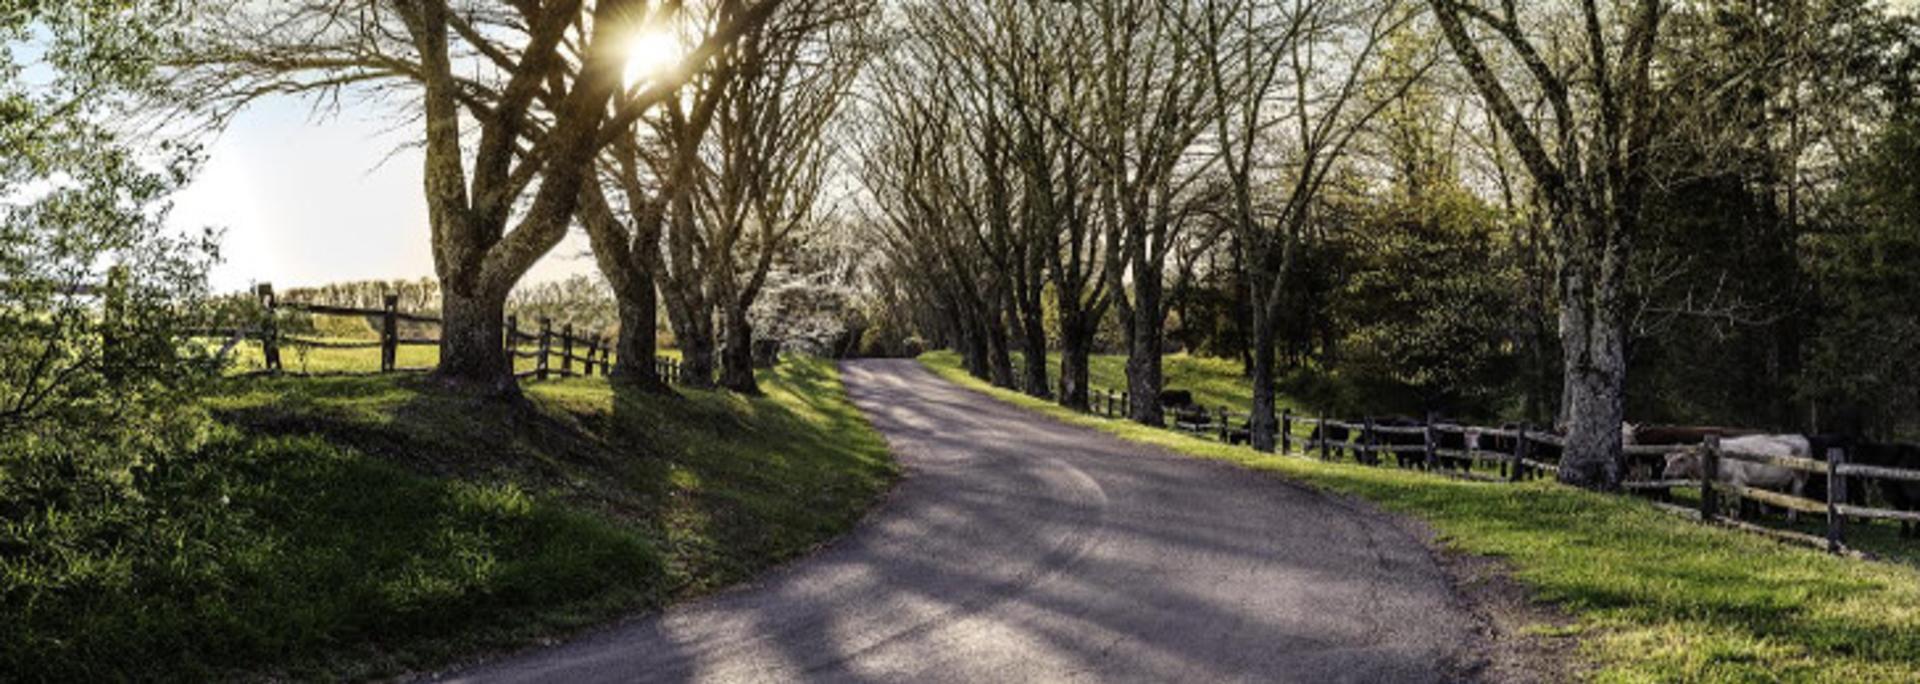 Driveway to James Monroe's Highland